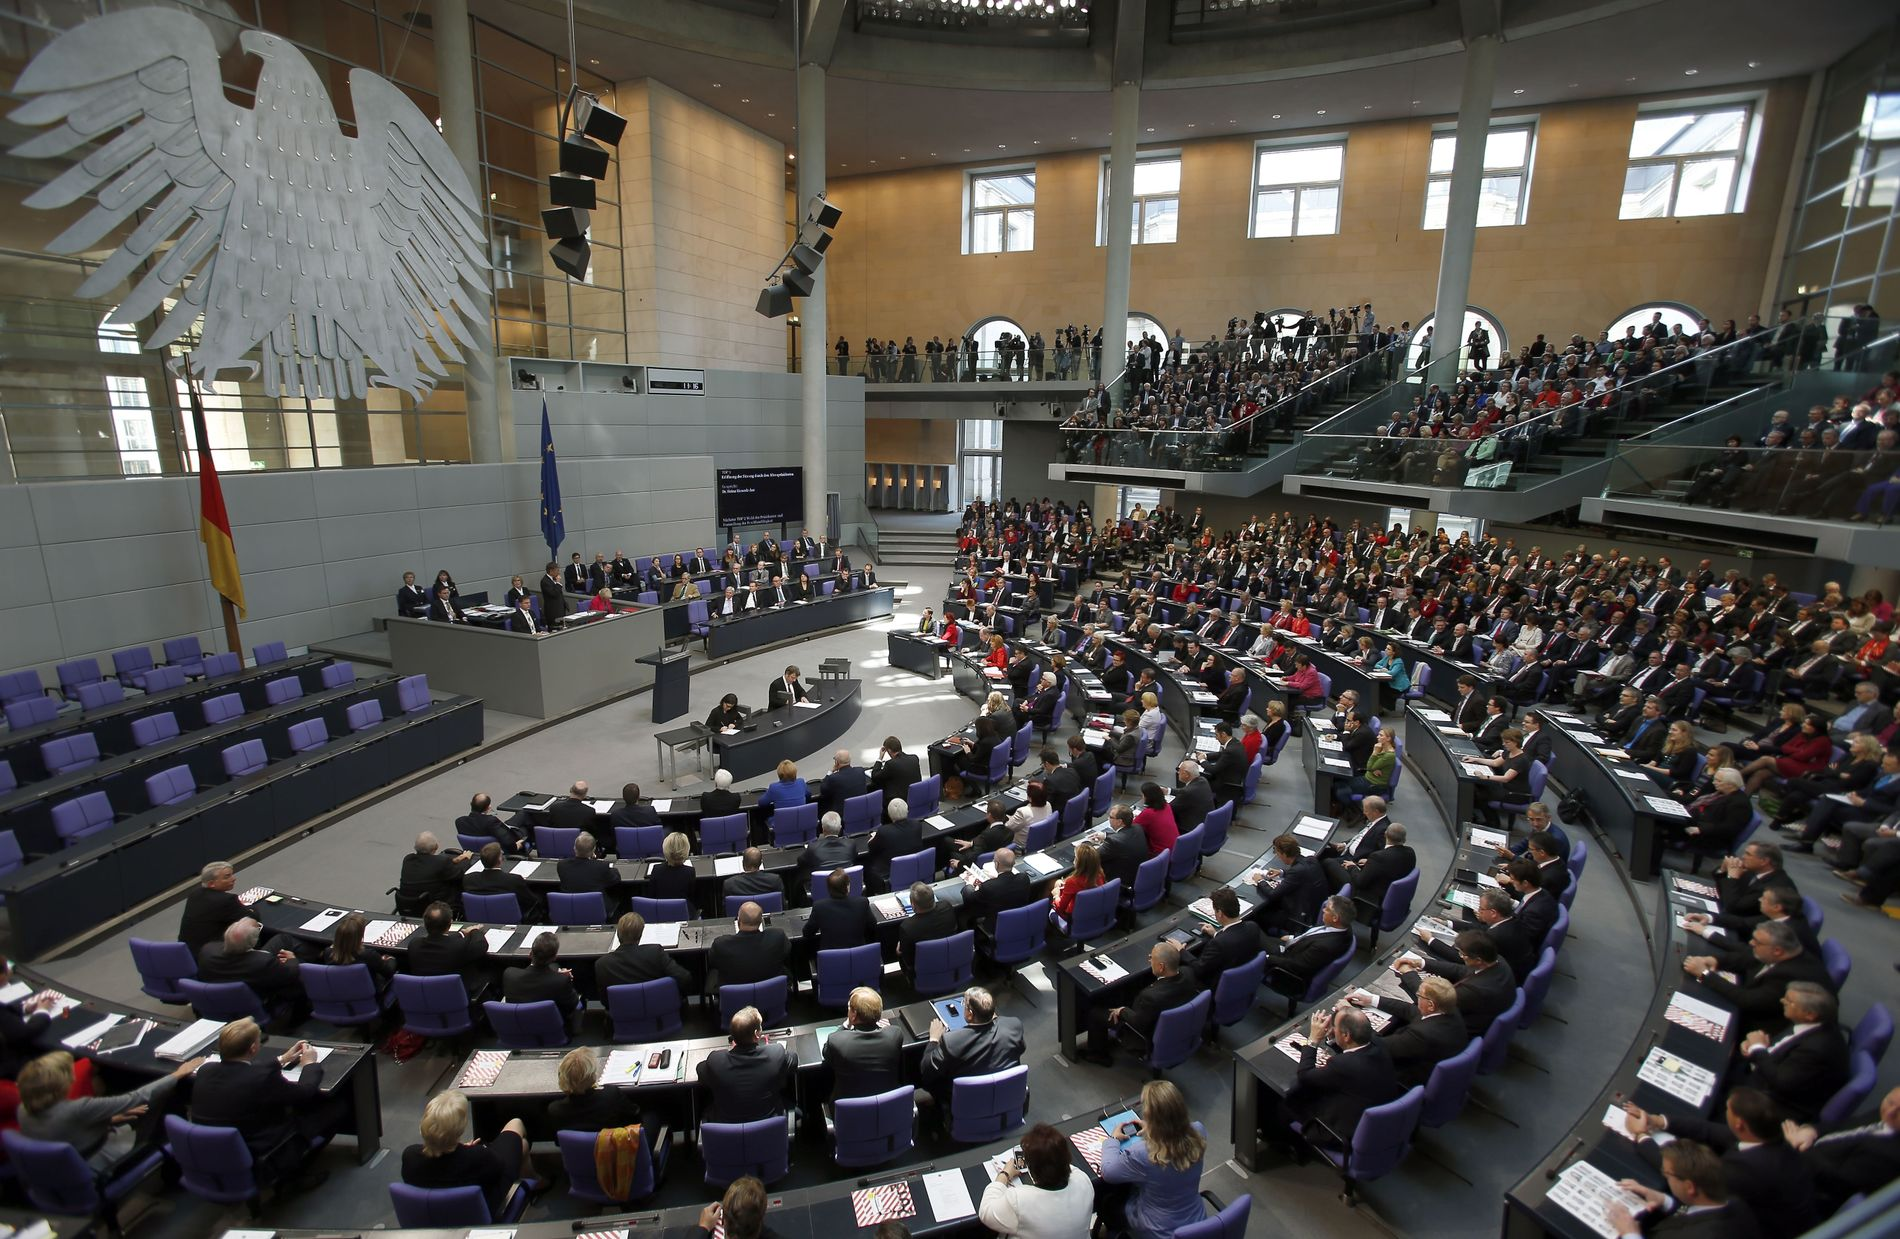 Tysklands nye radikale politikere - VG